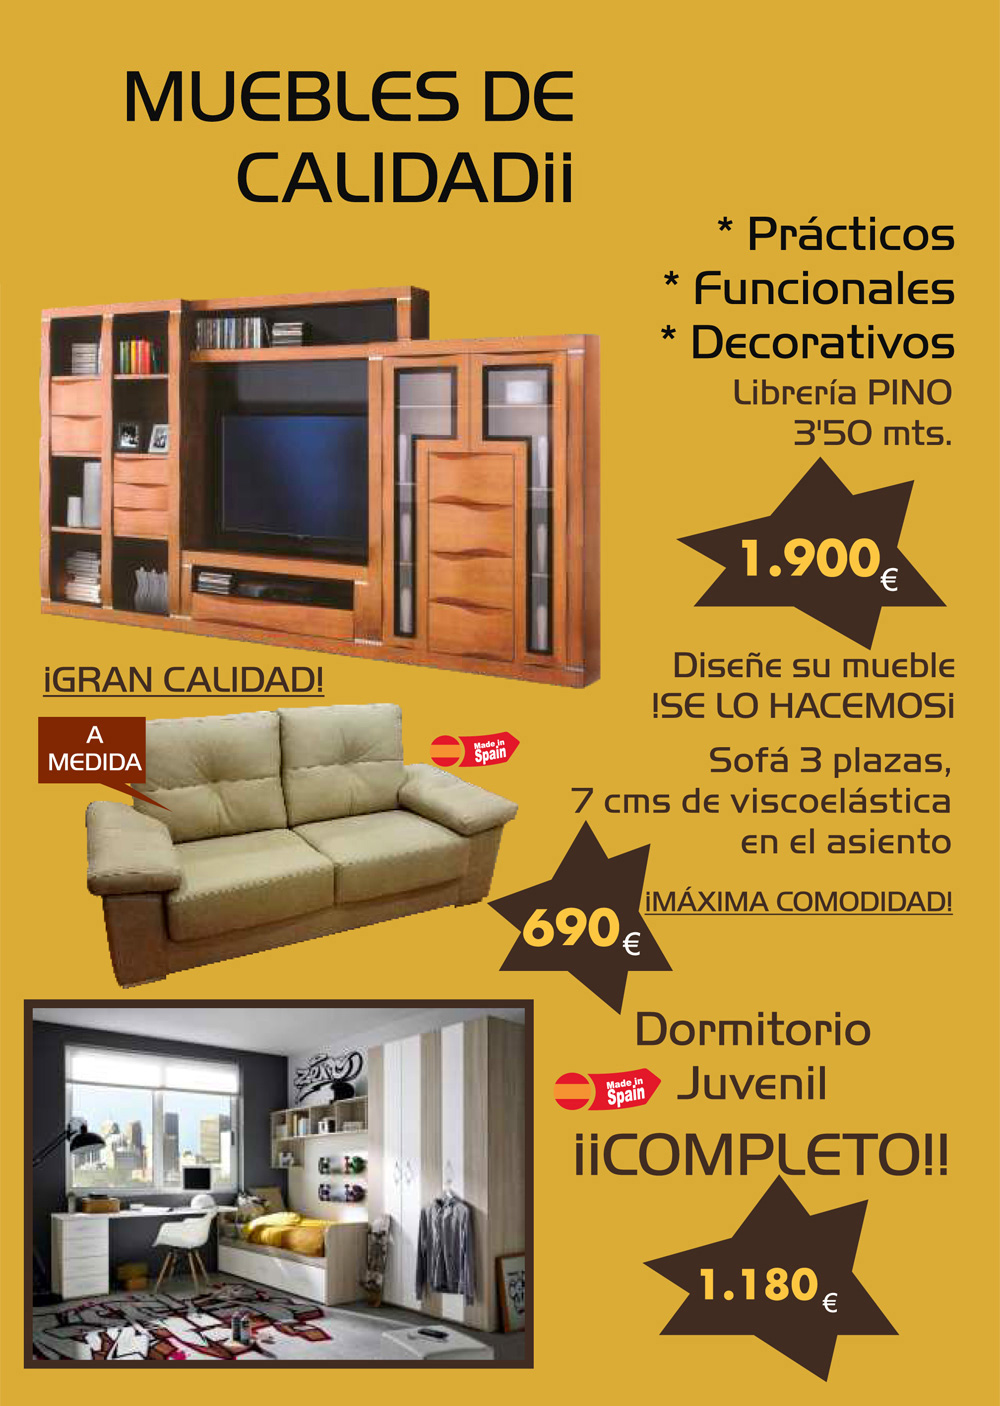 Muebles descuento obtenga ideas dise o de muebles para for Compra de muebles